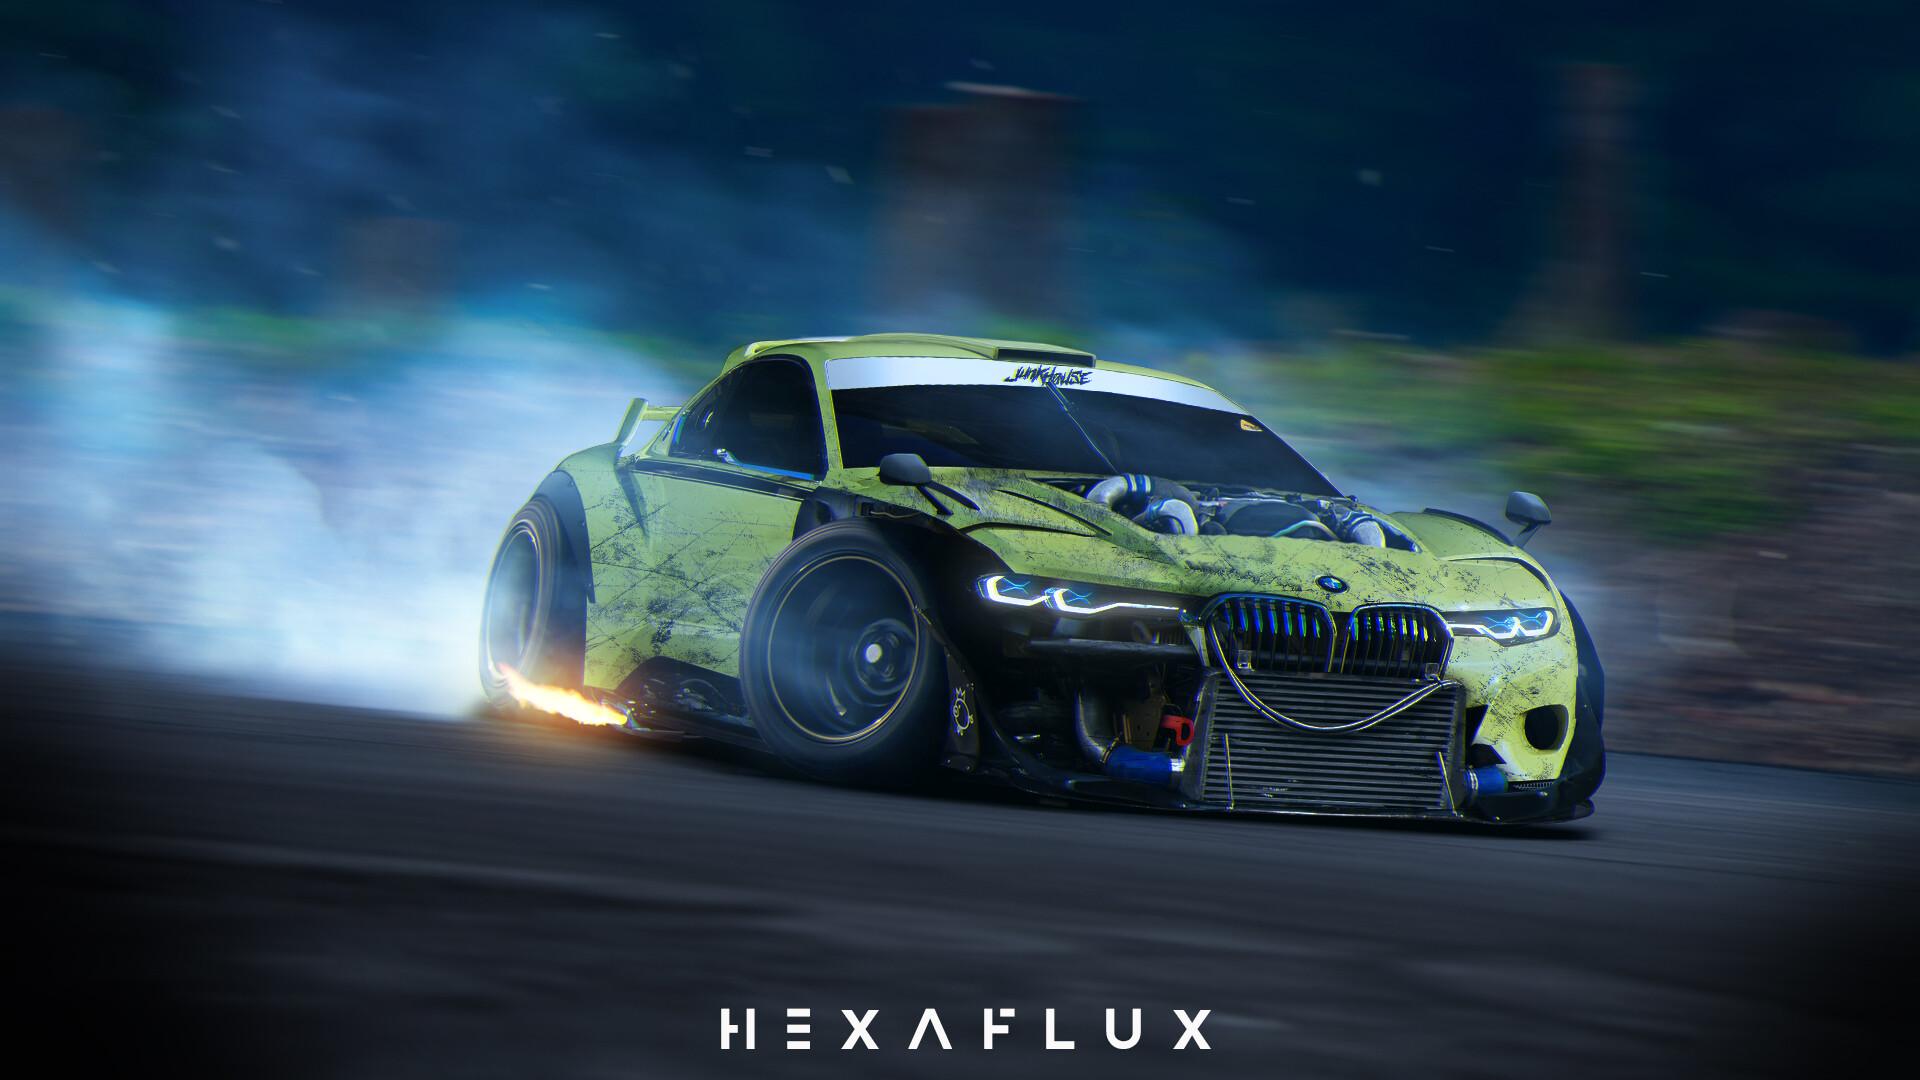 hexaflux-3-0csl.jpg